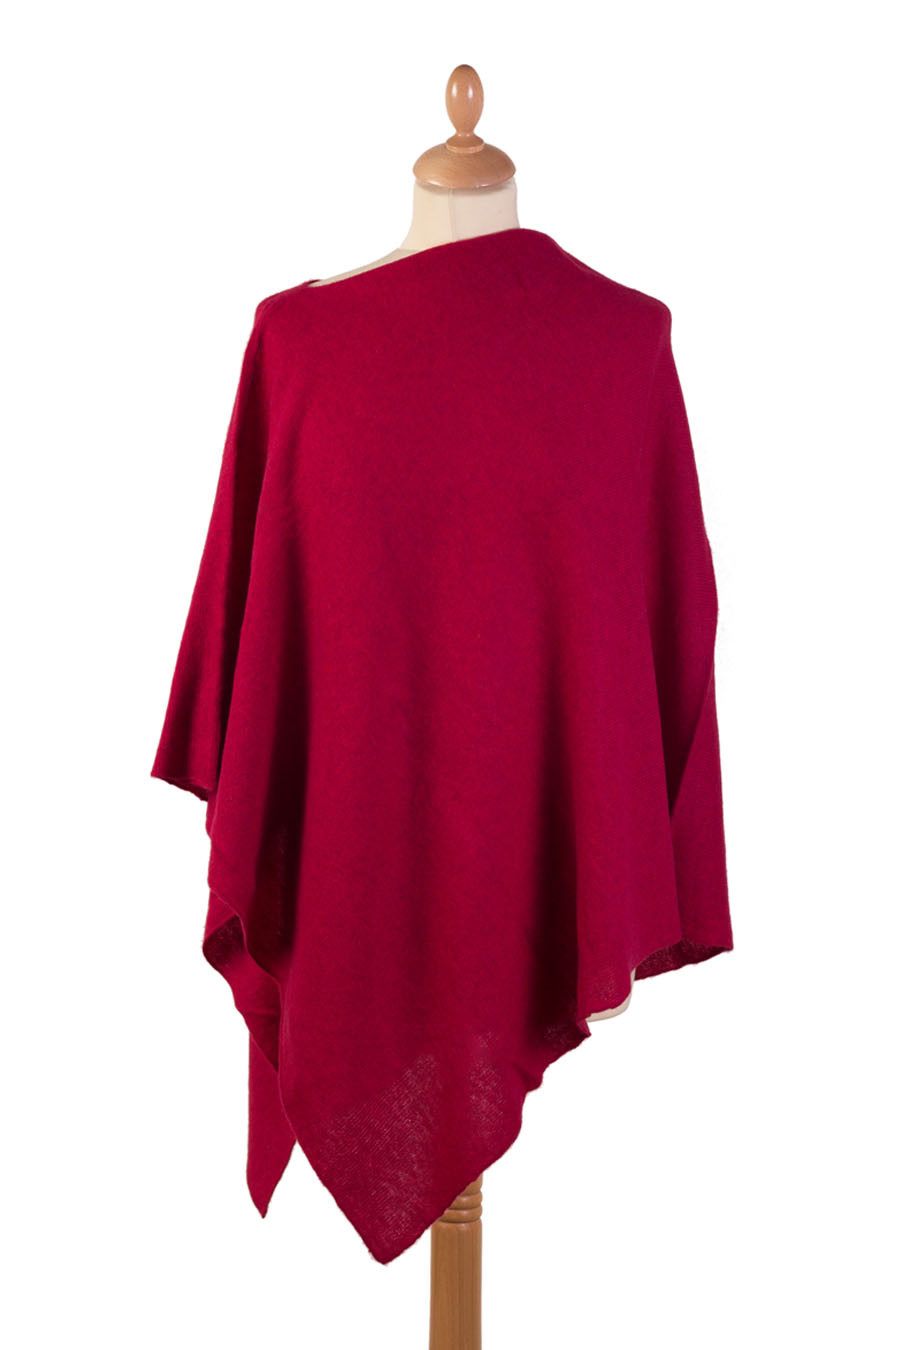 Poncho cachemire CARMEN Rouge rubis